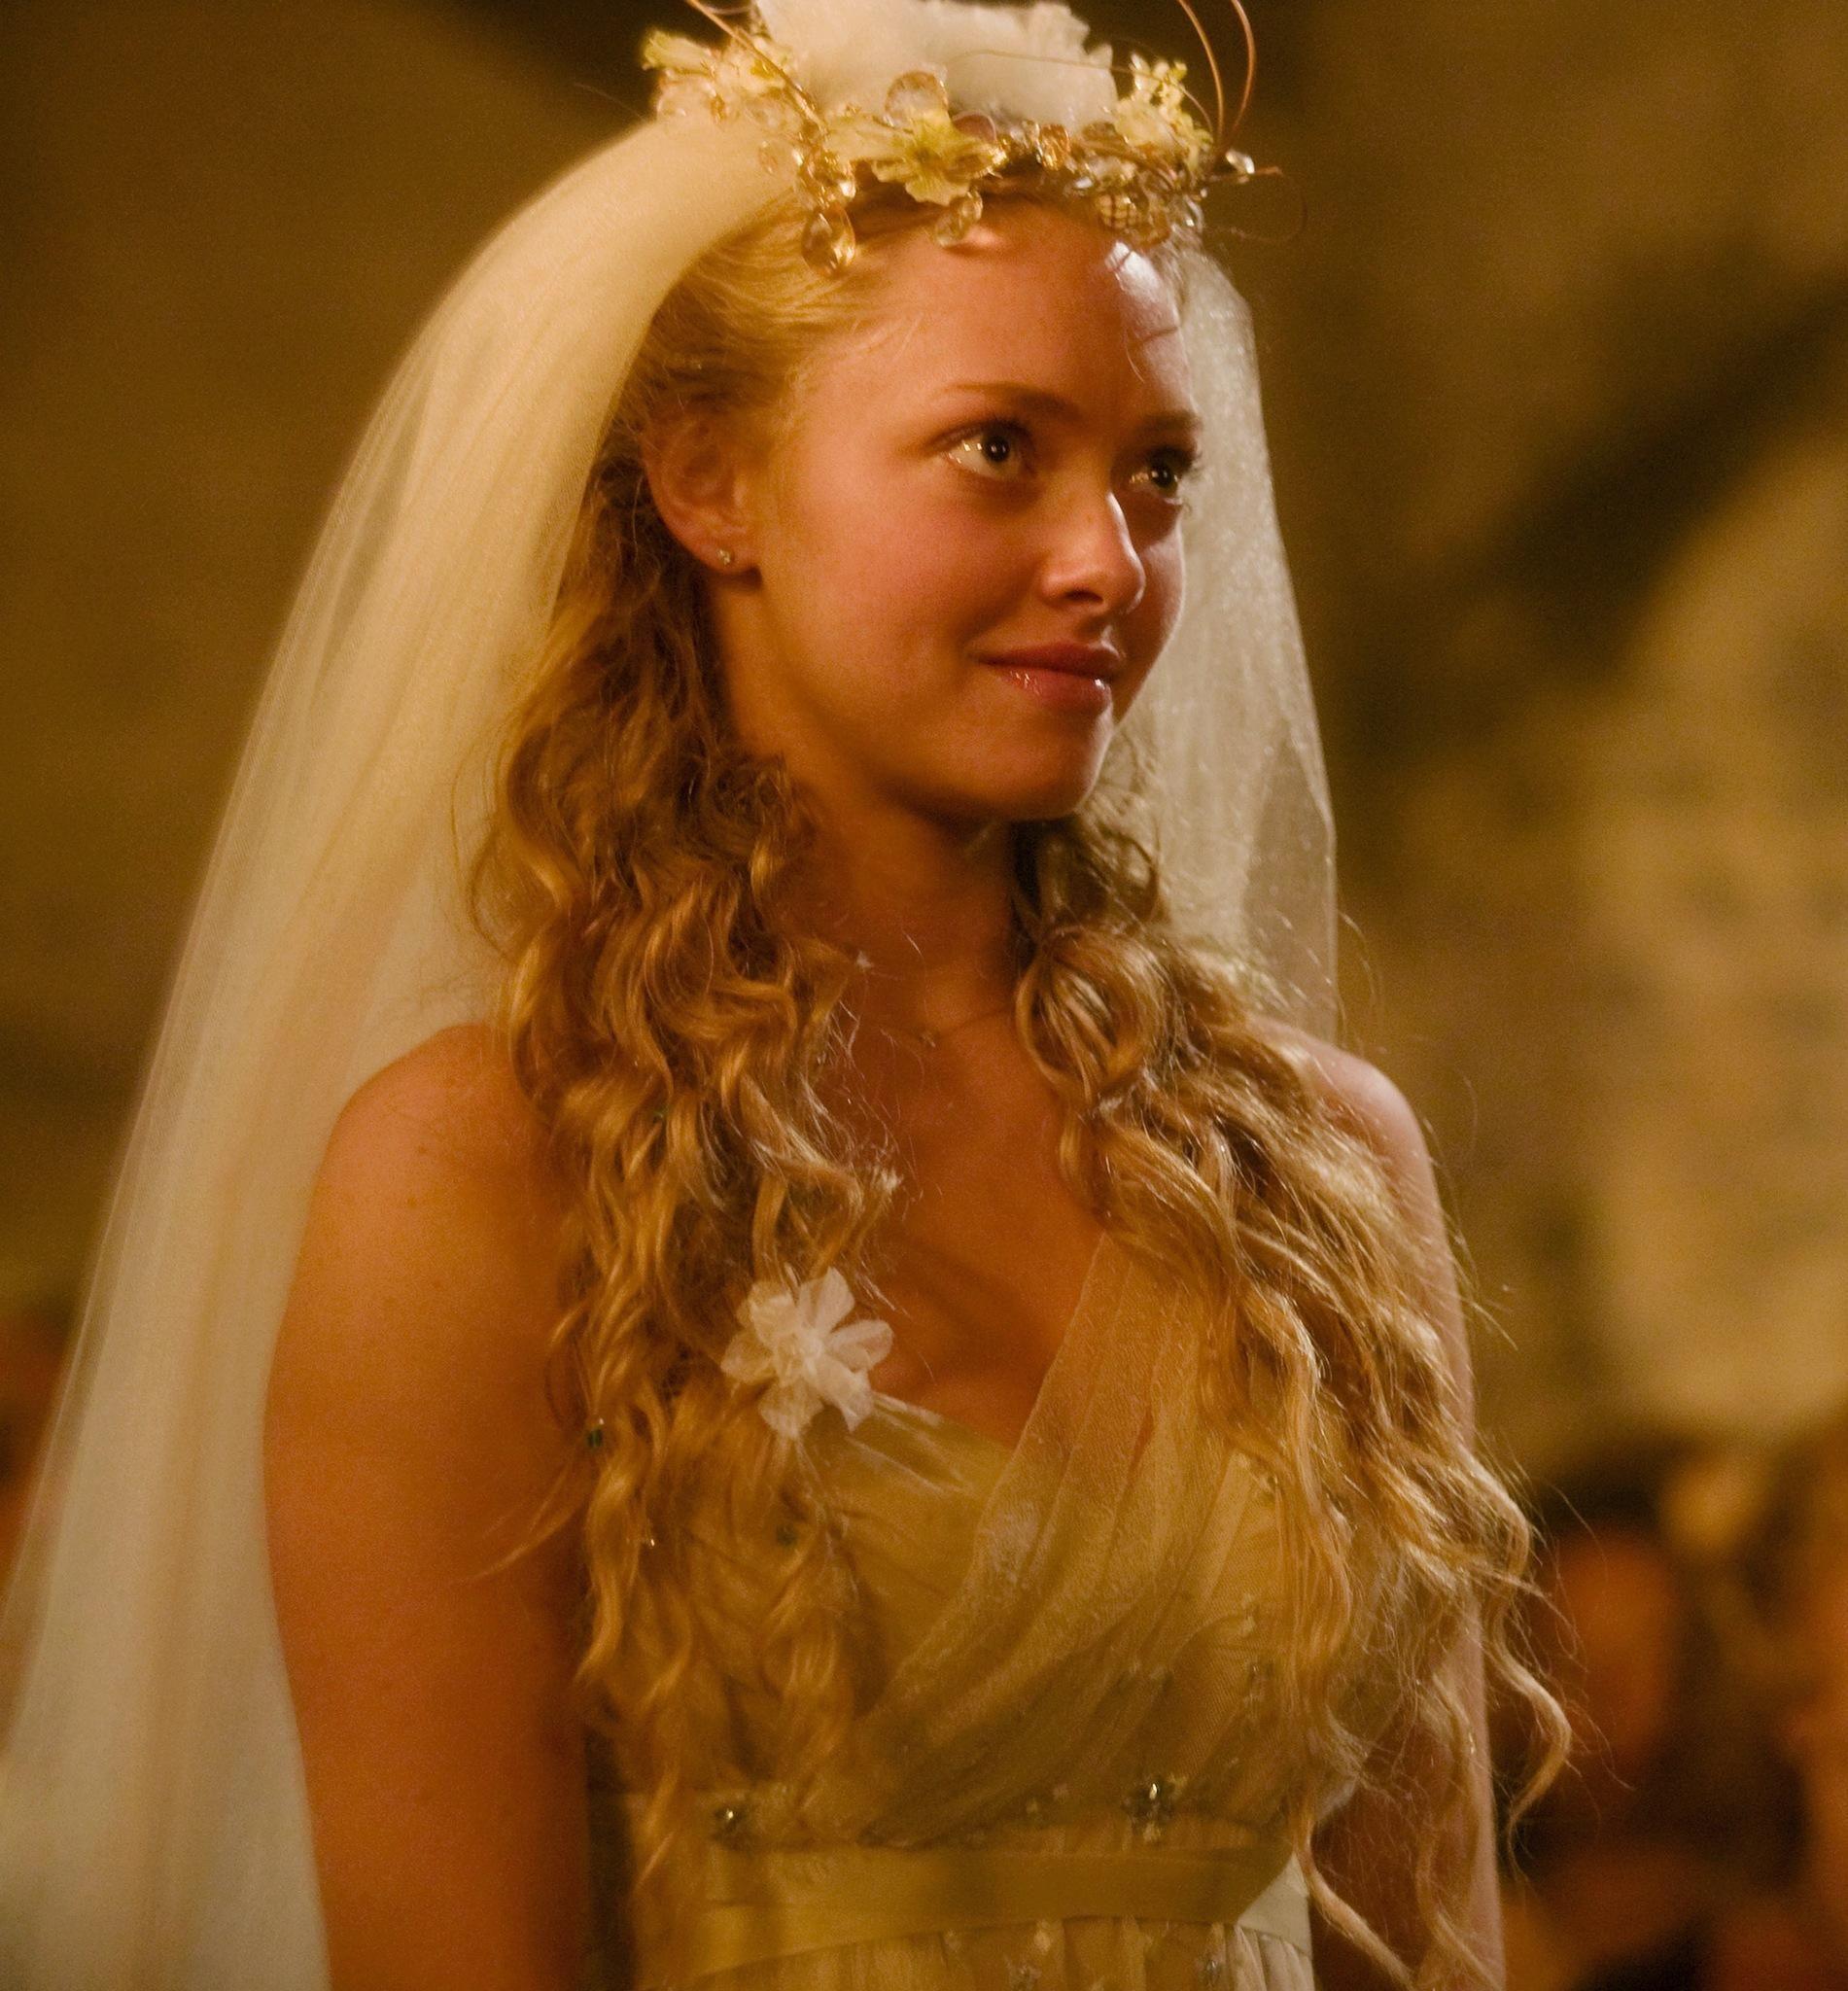 Still of Amanda Seyfried in Mamma Mia! (2008) http://www.movpins.com/dHQwNzk1NDIx/mamma-mia!-(2008)/still-2946805760